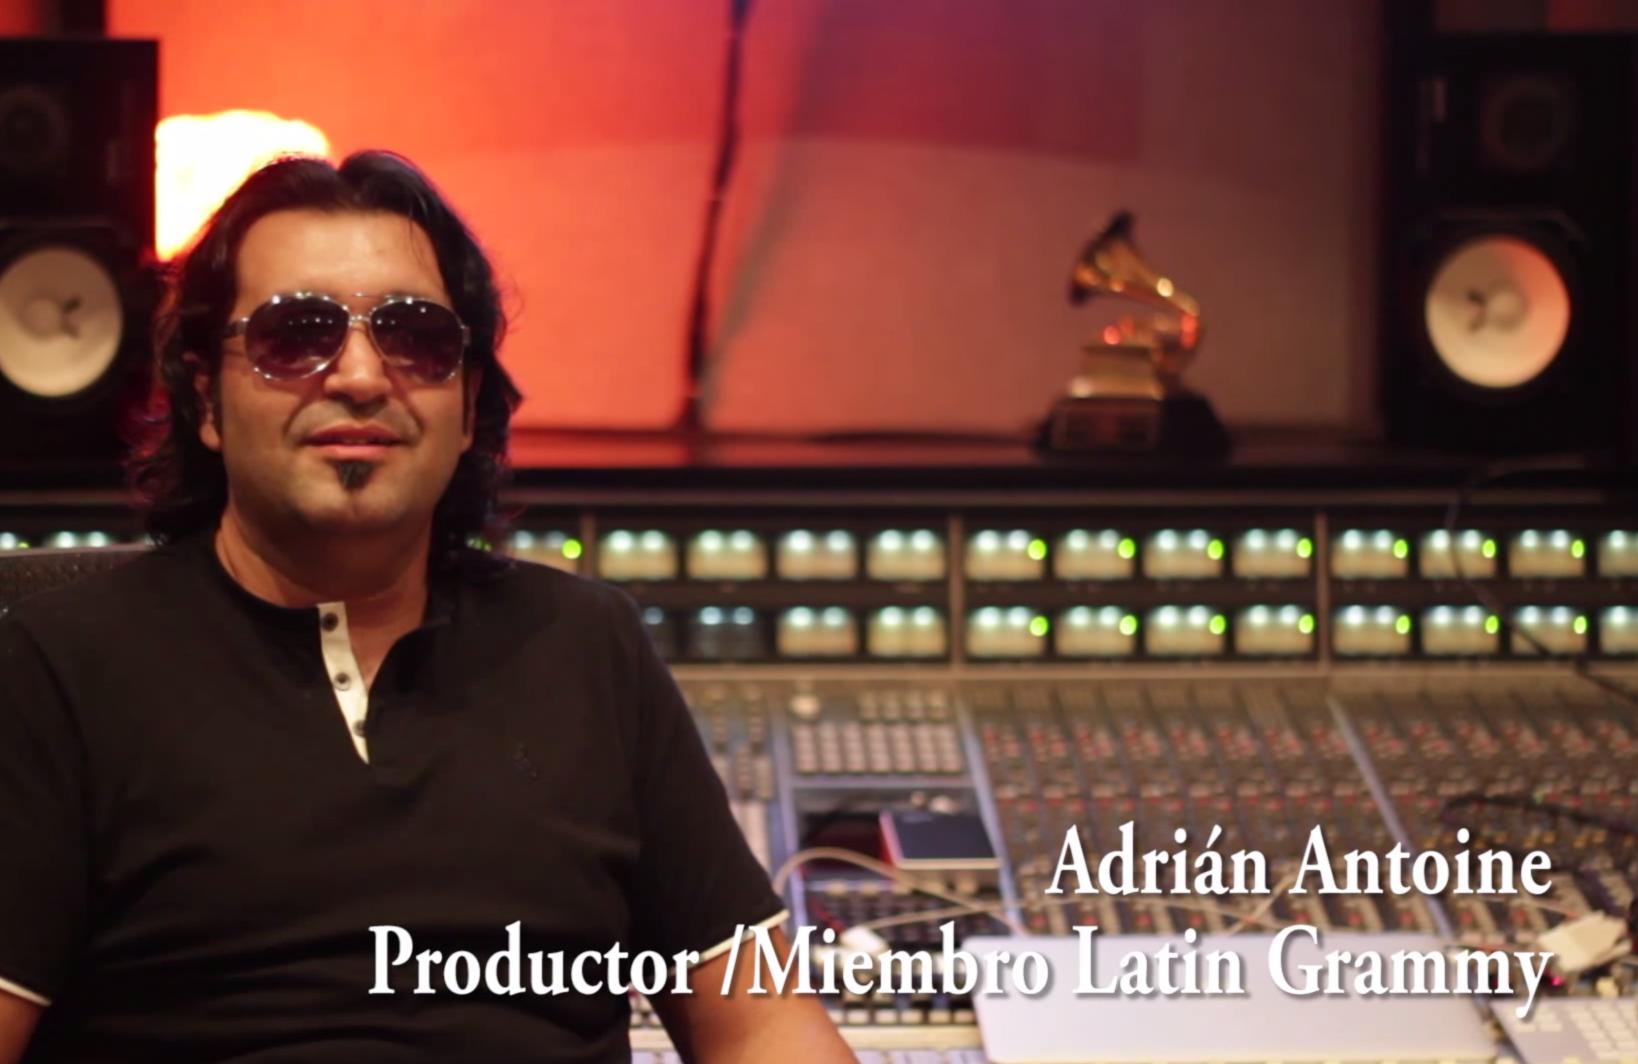 Adrian Antoine